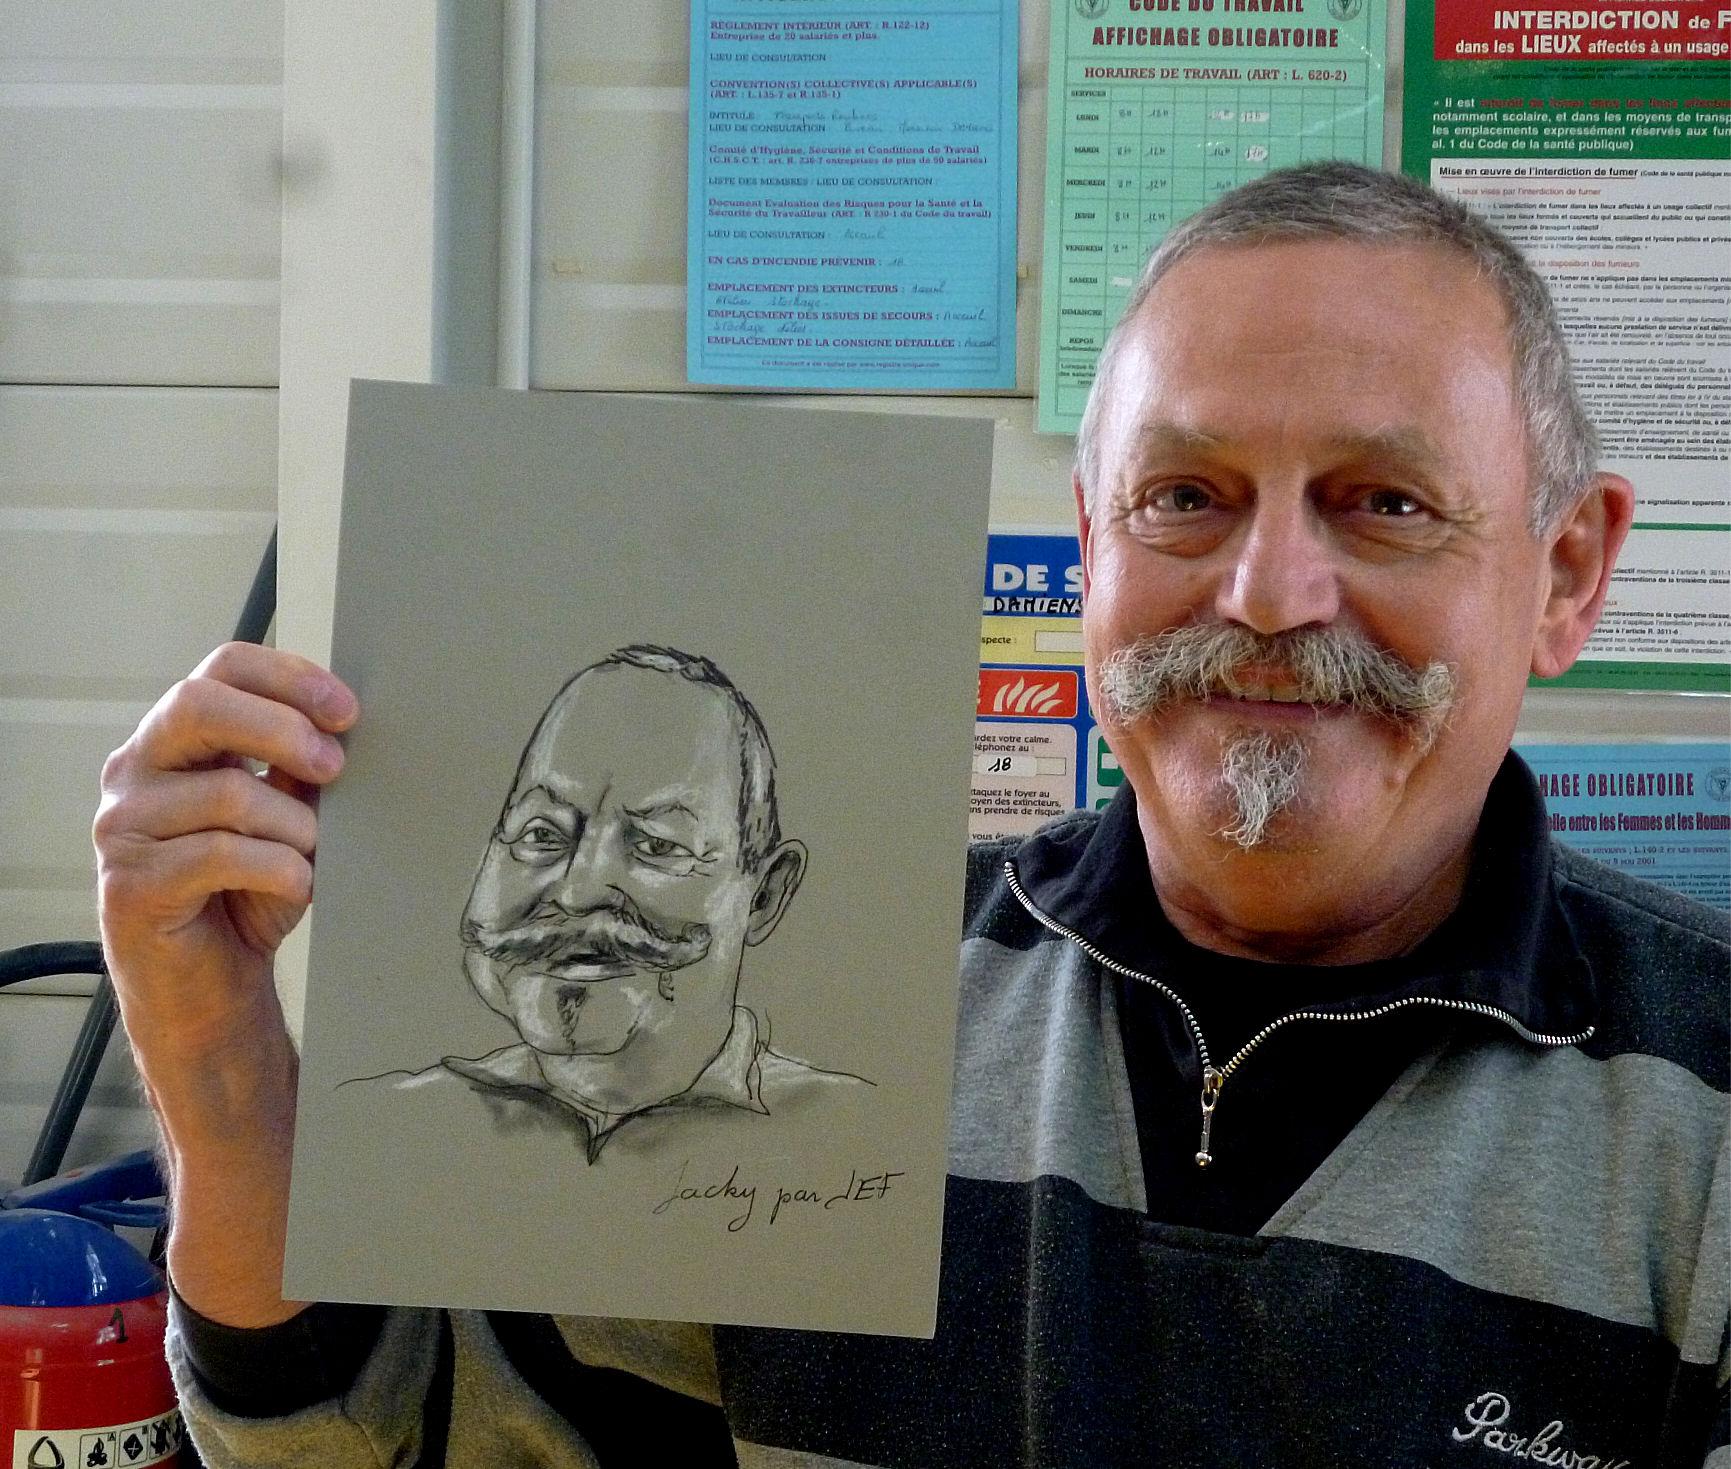 Jacky caricature par JEF